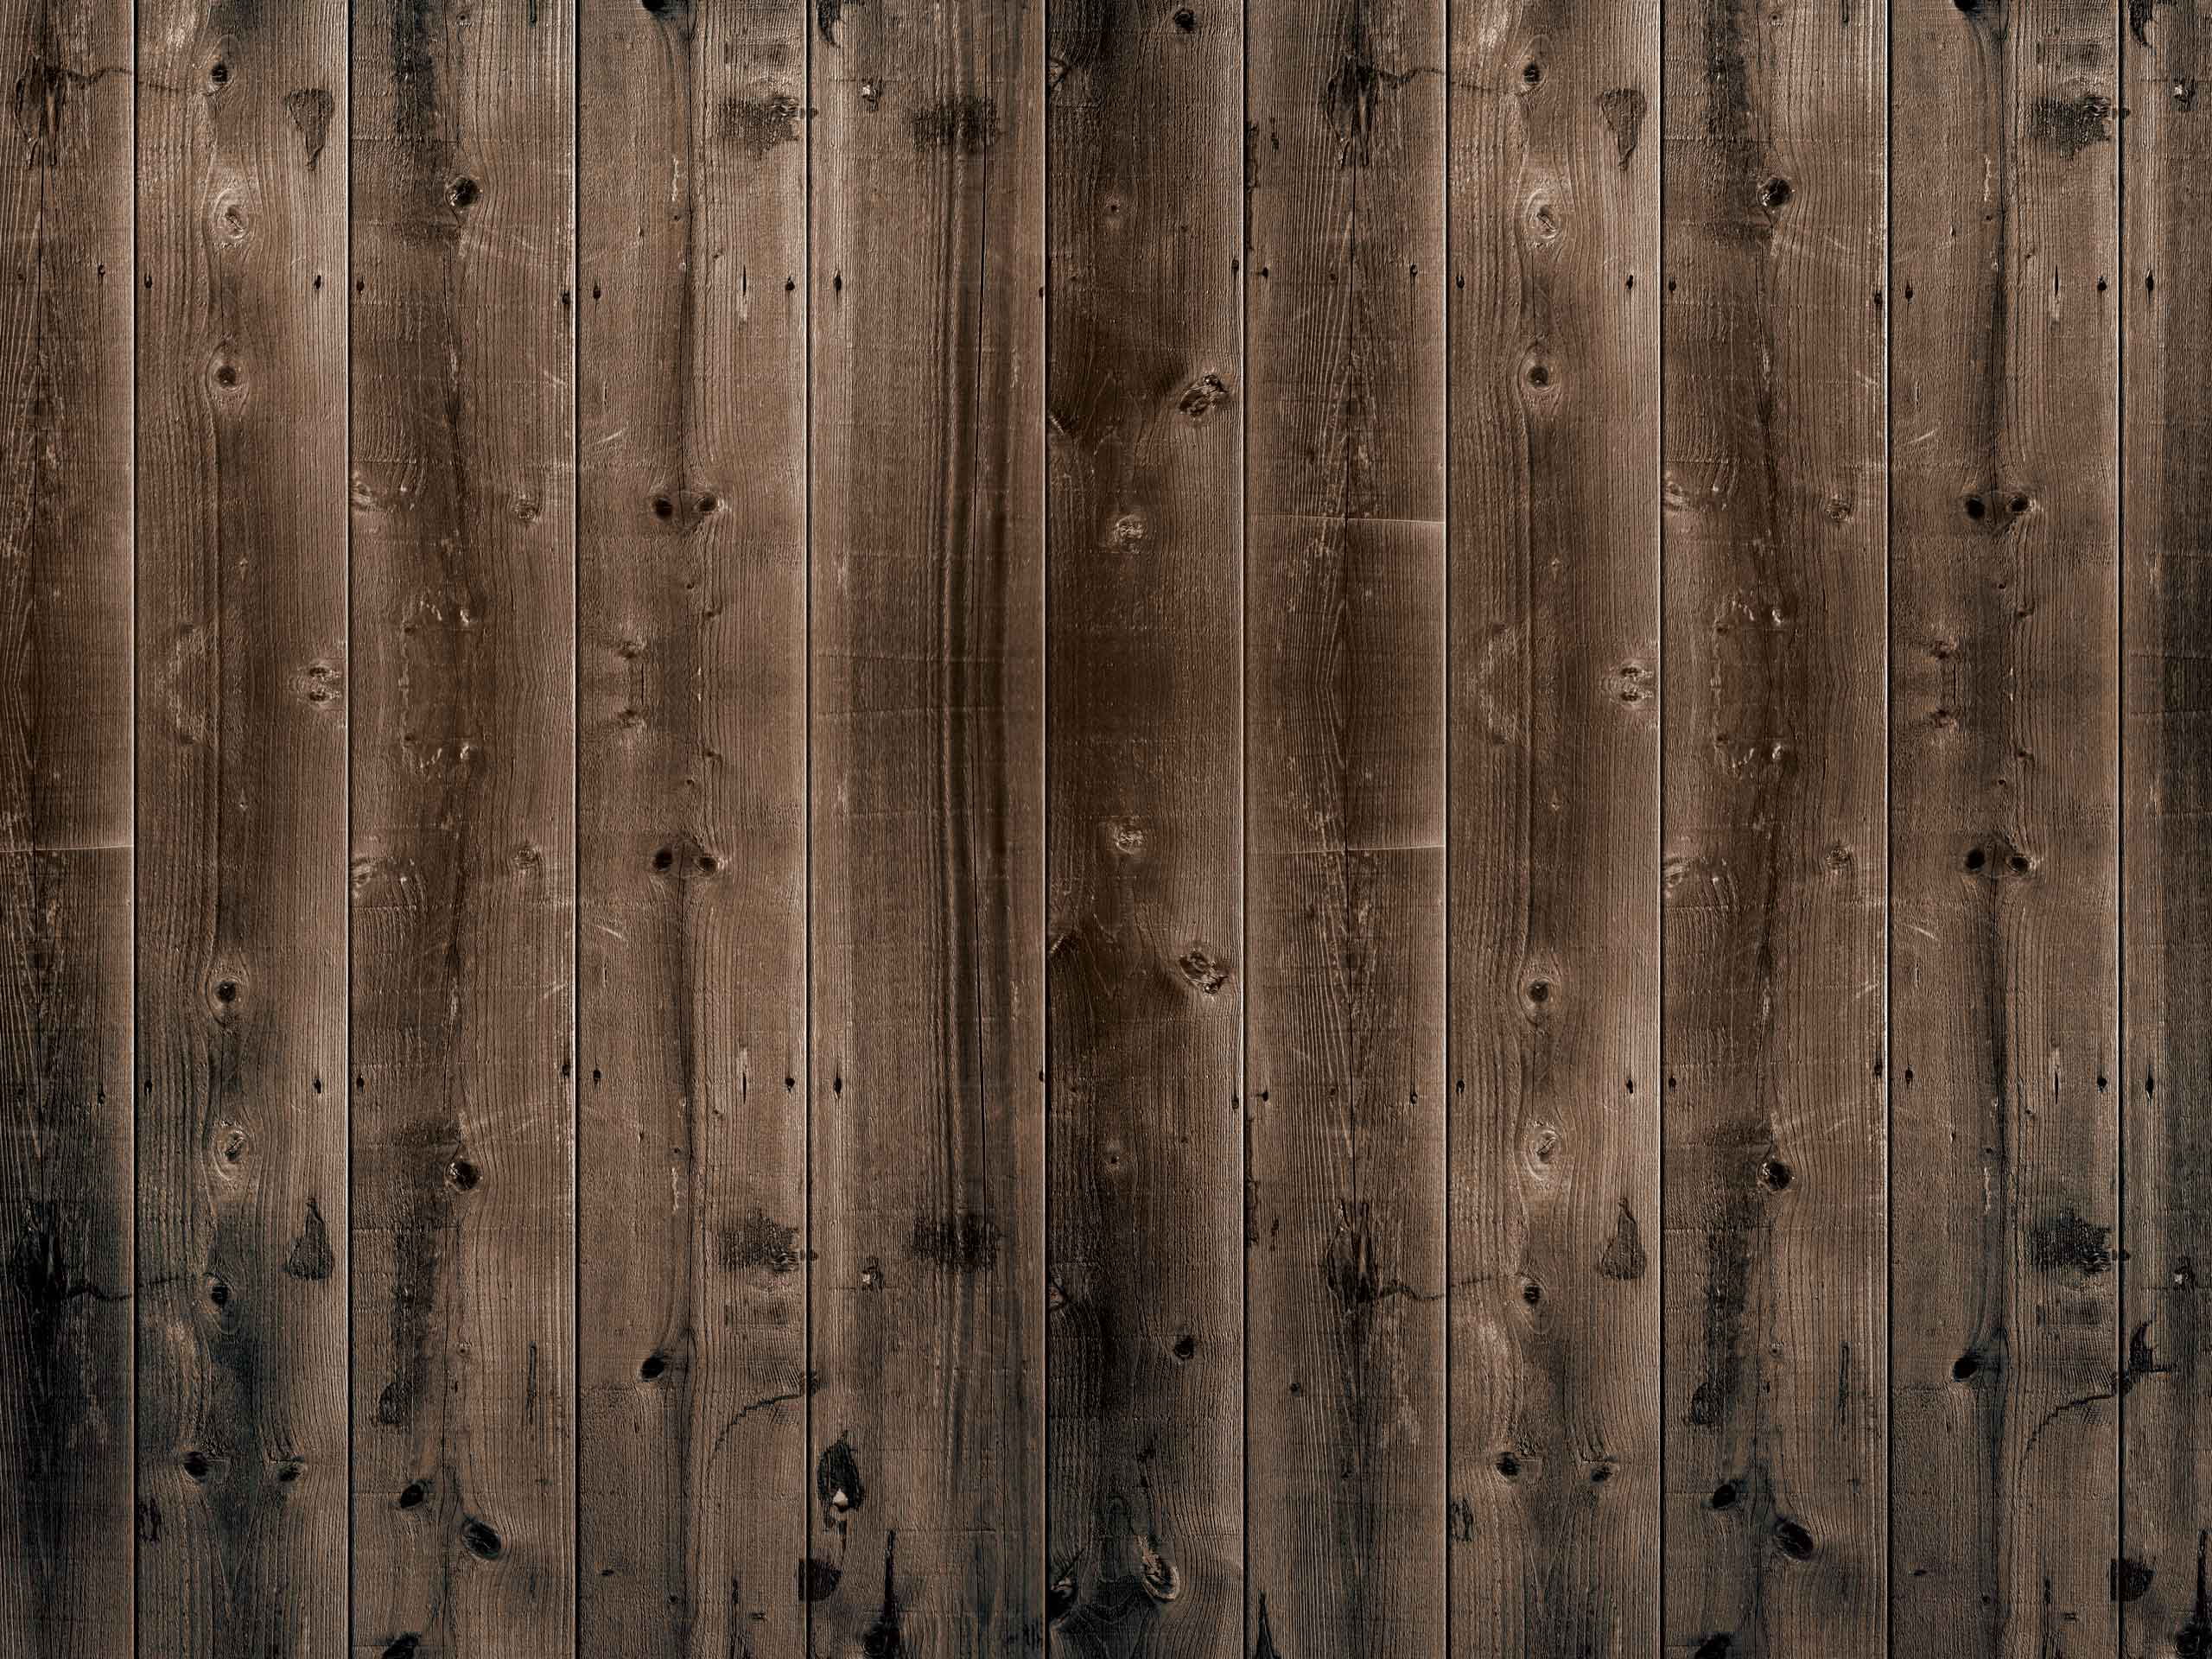 Old barn wood wallpaper wallpapersafari for Barn wood salvage companies